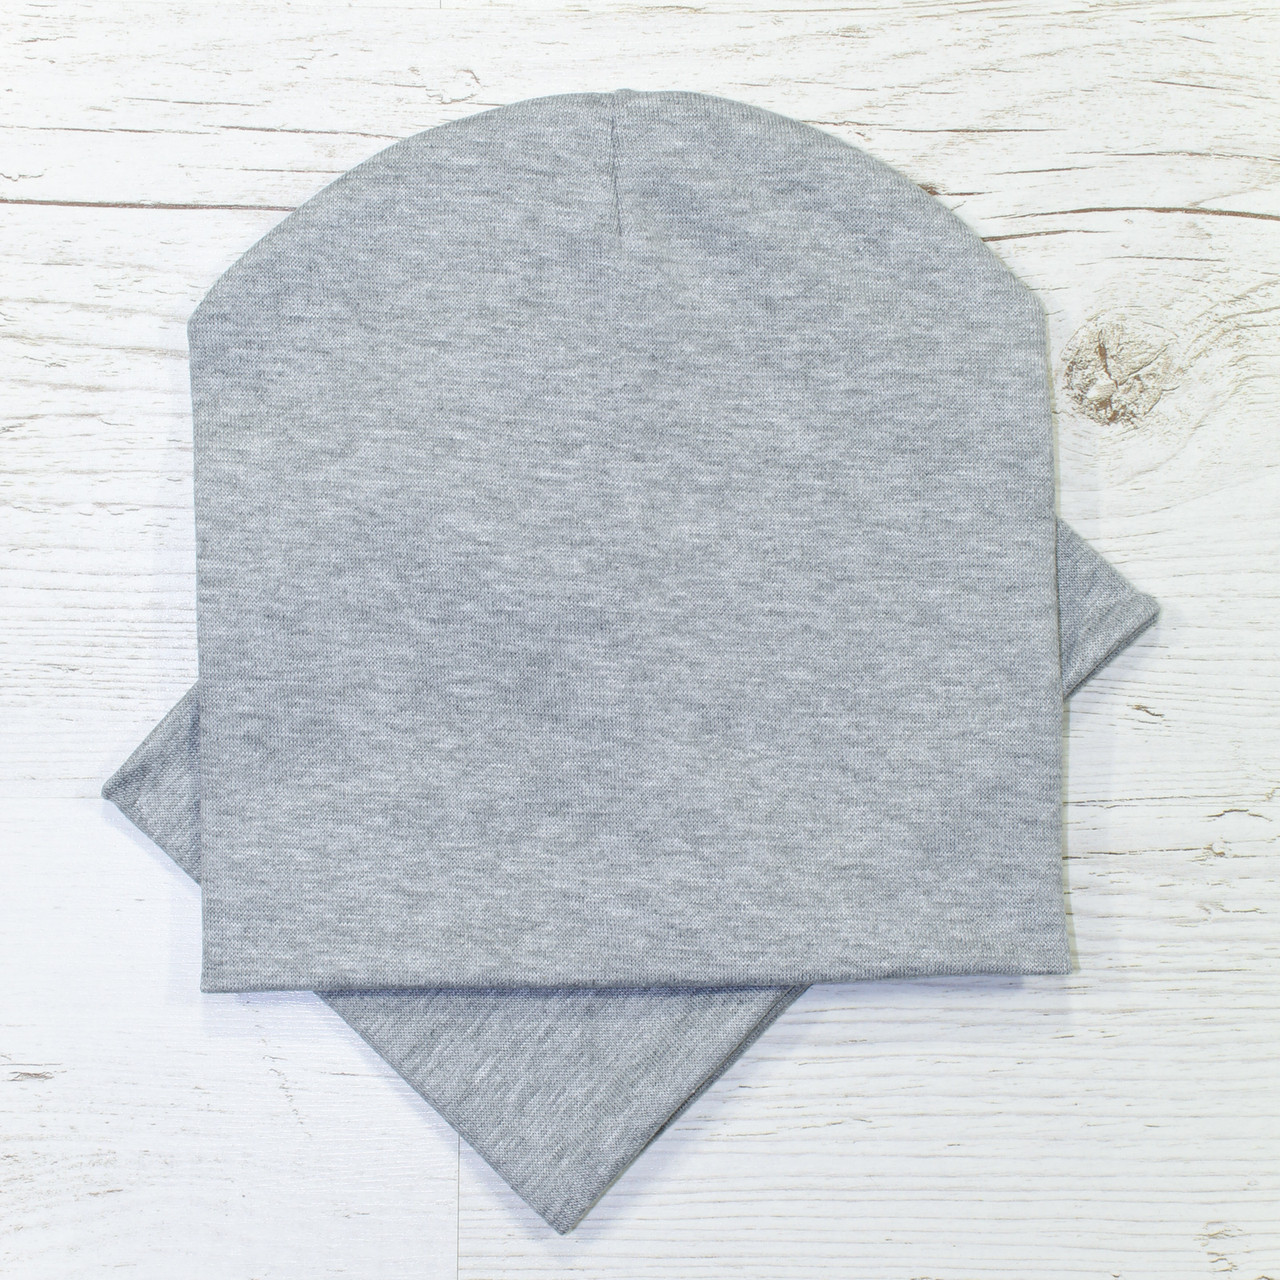 Шапка трикотажная детская двойная комплект серый меланж 48-52р.